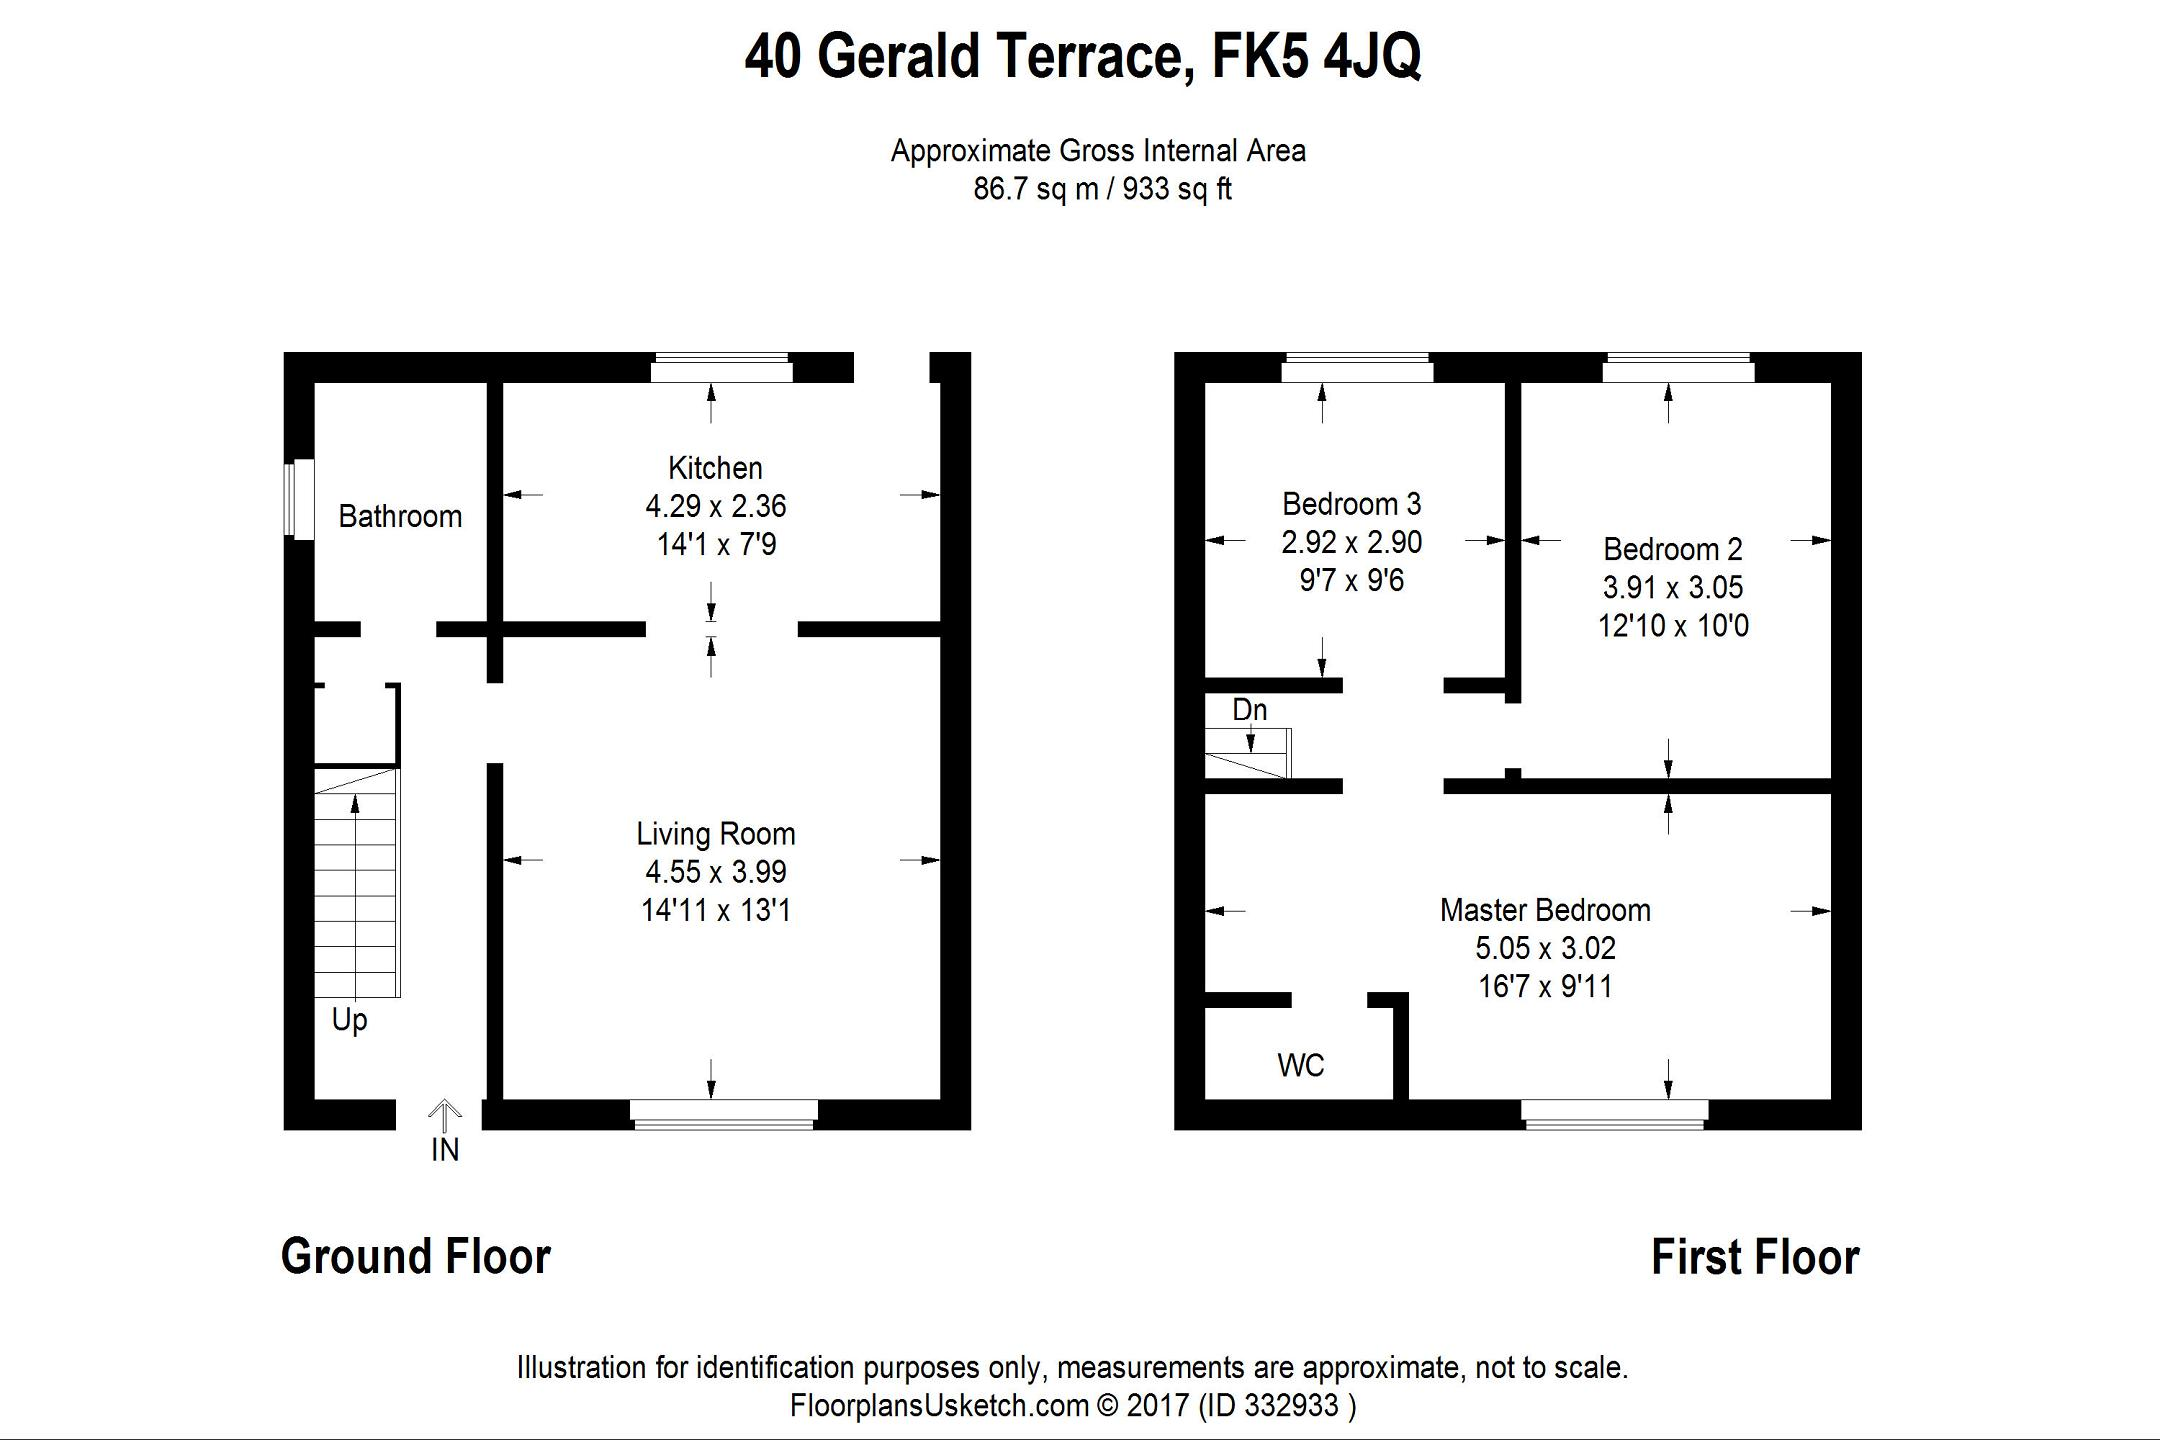 3 bedroom terrace for sale in gerald terrace for 16 royal terrace glasgow